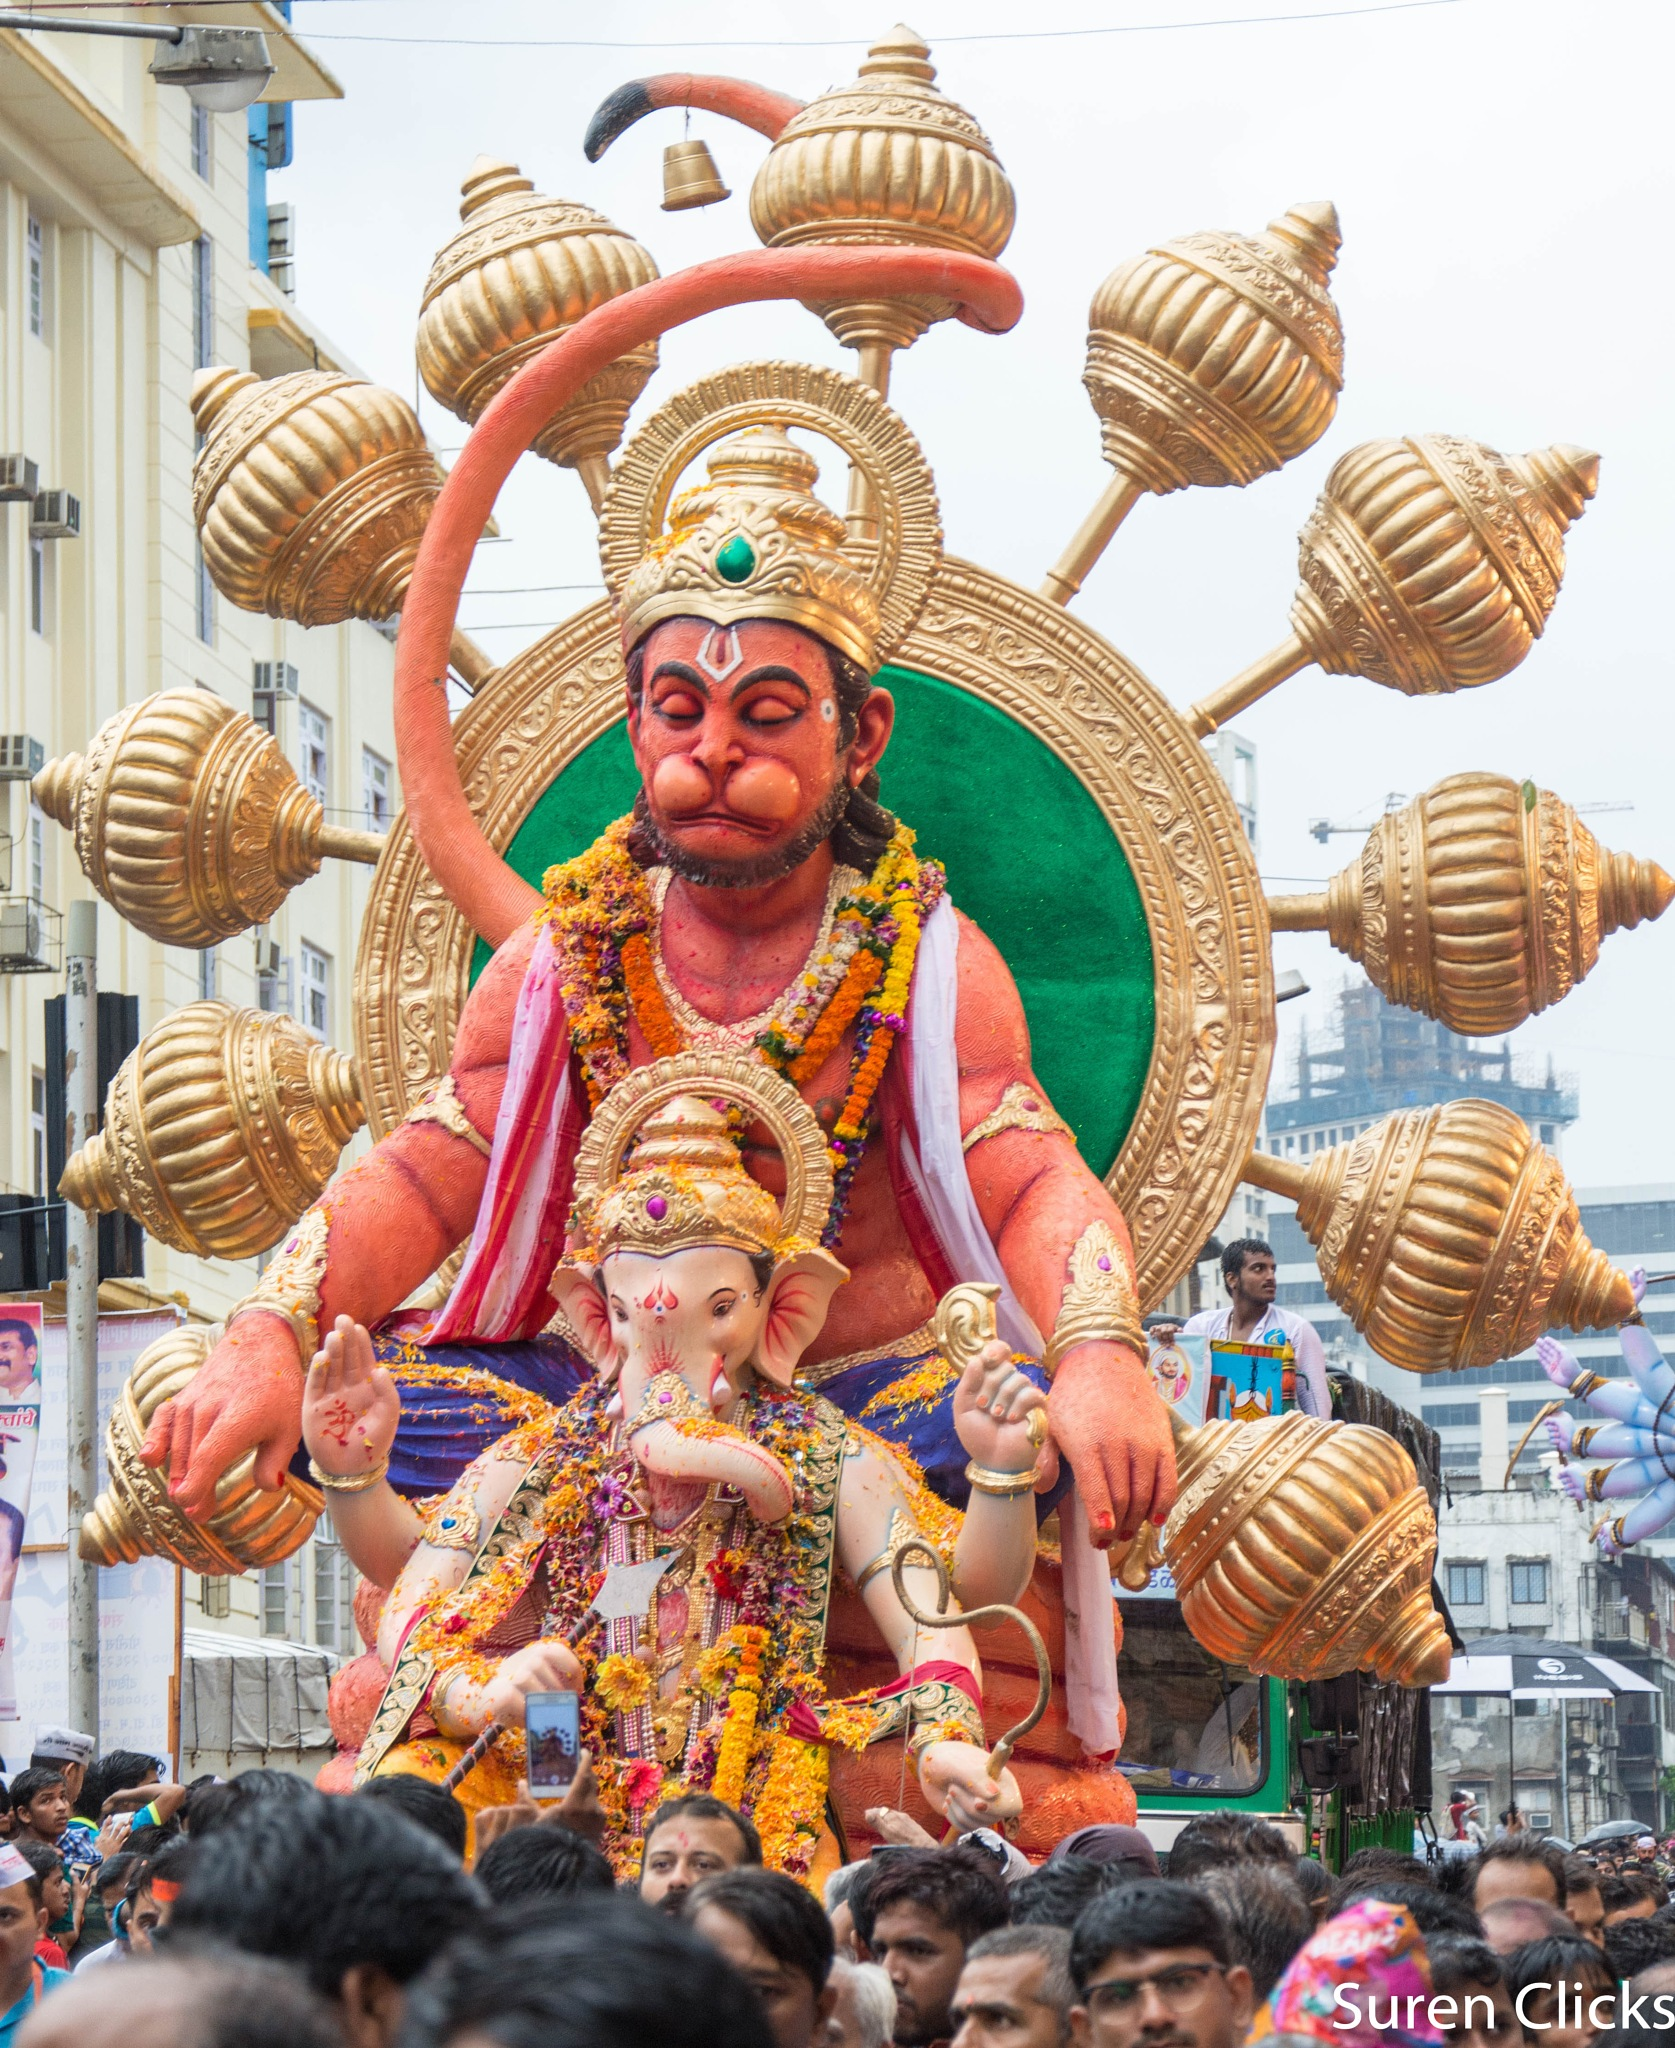 गणपति बप्पा मोरया , अगले बरस तु जल्दी आ. Some clicks at Girgaon Chowpatty  by Surendra Mehta